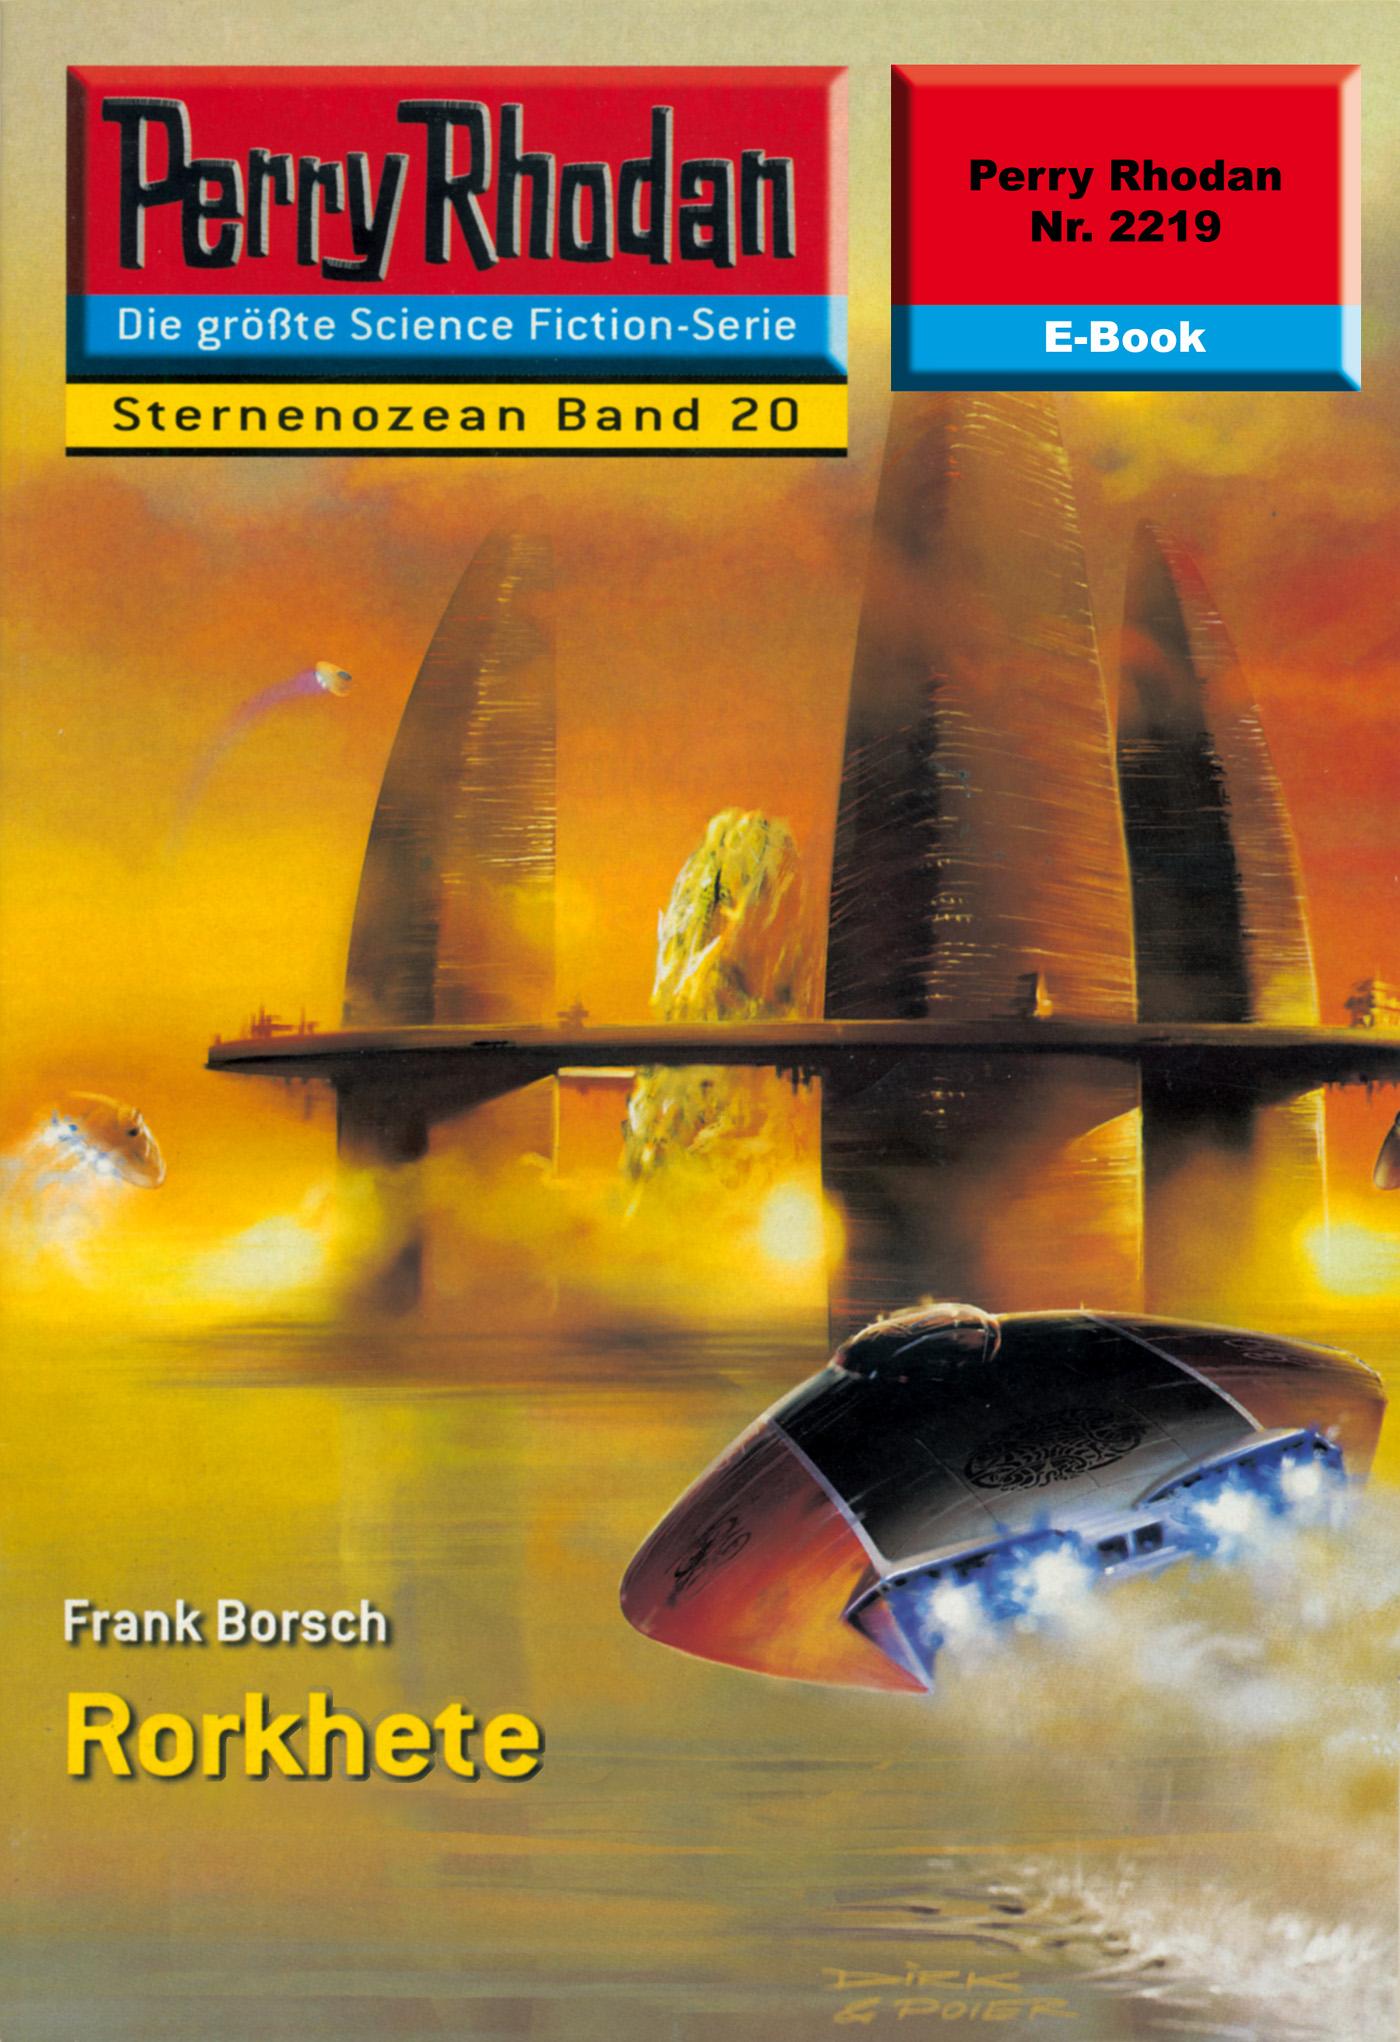 Perry Rhodan 2219: Rorkhete ( Frank  Borsch  )